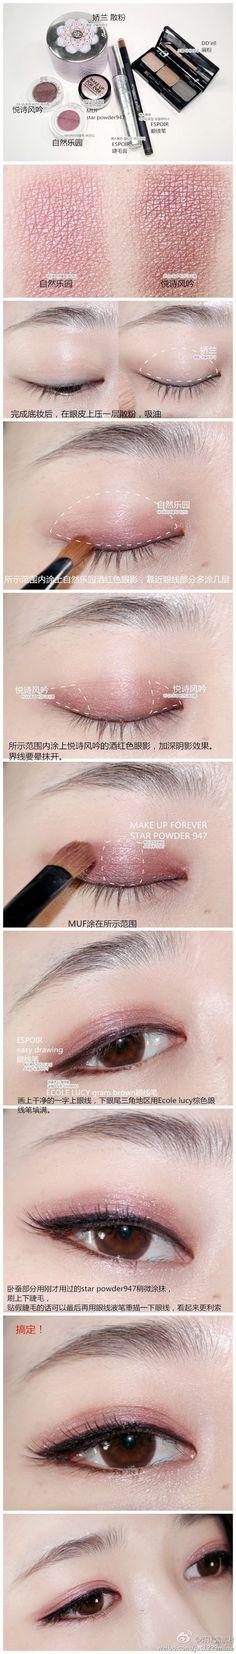 asian make up ⭐️⭐️ www.AsianSkincare.Rocks